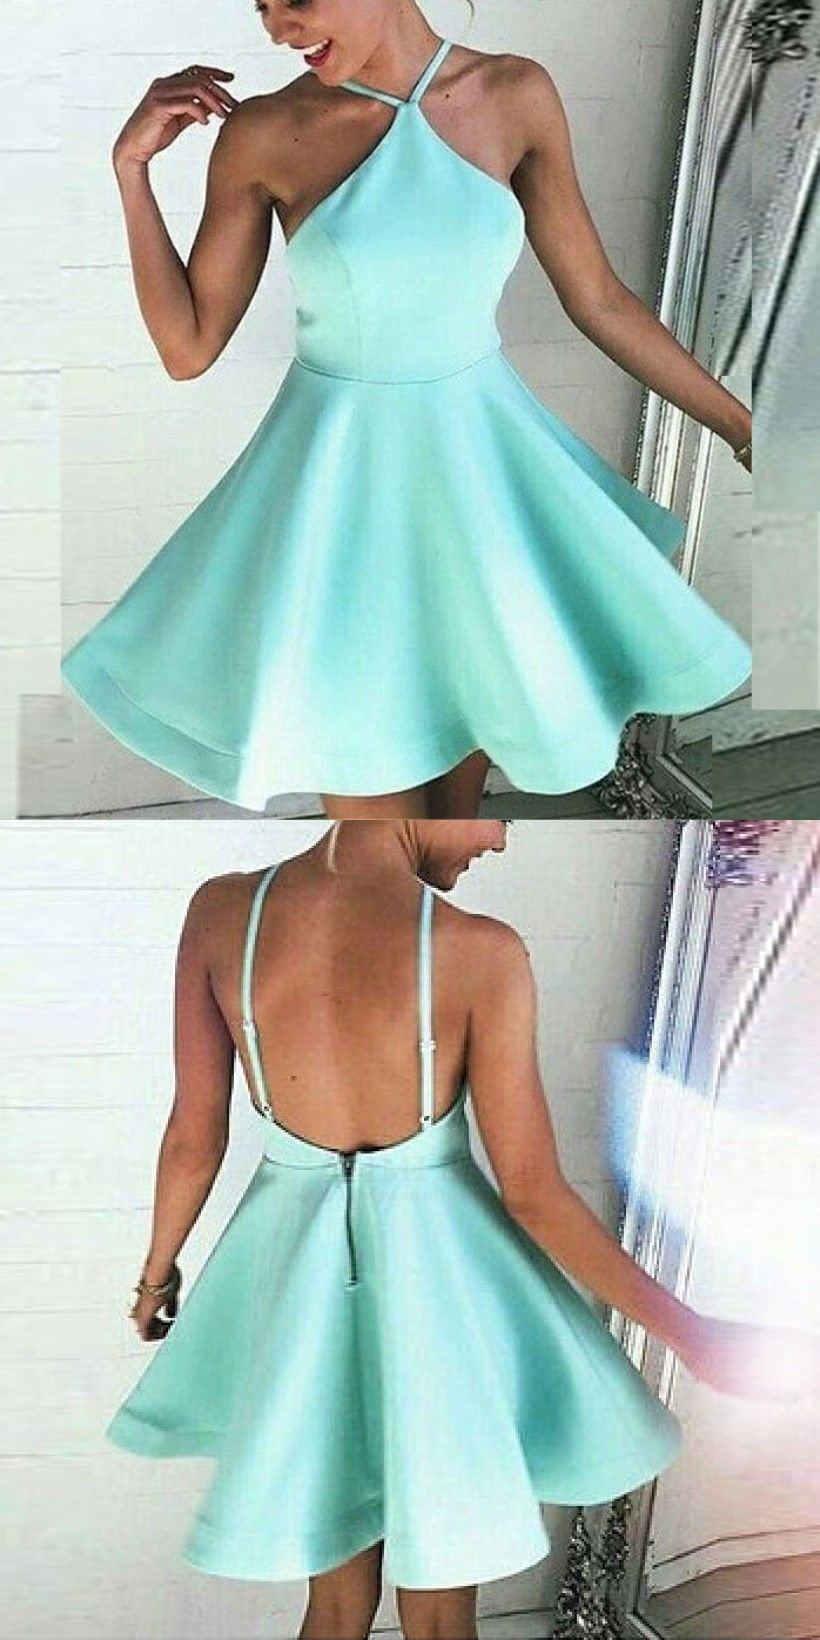 Aline halter backless mint green satin short homecoming dress